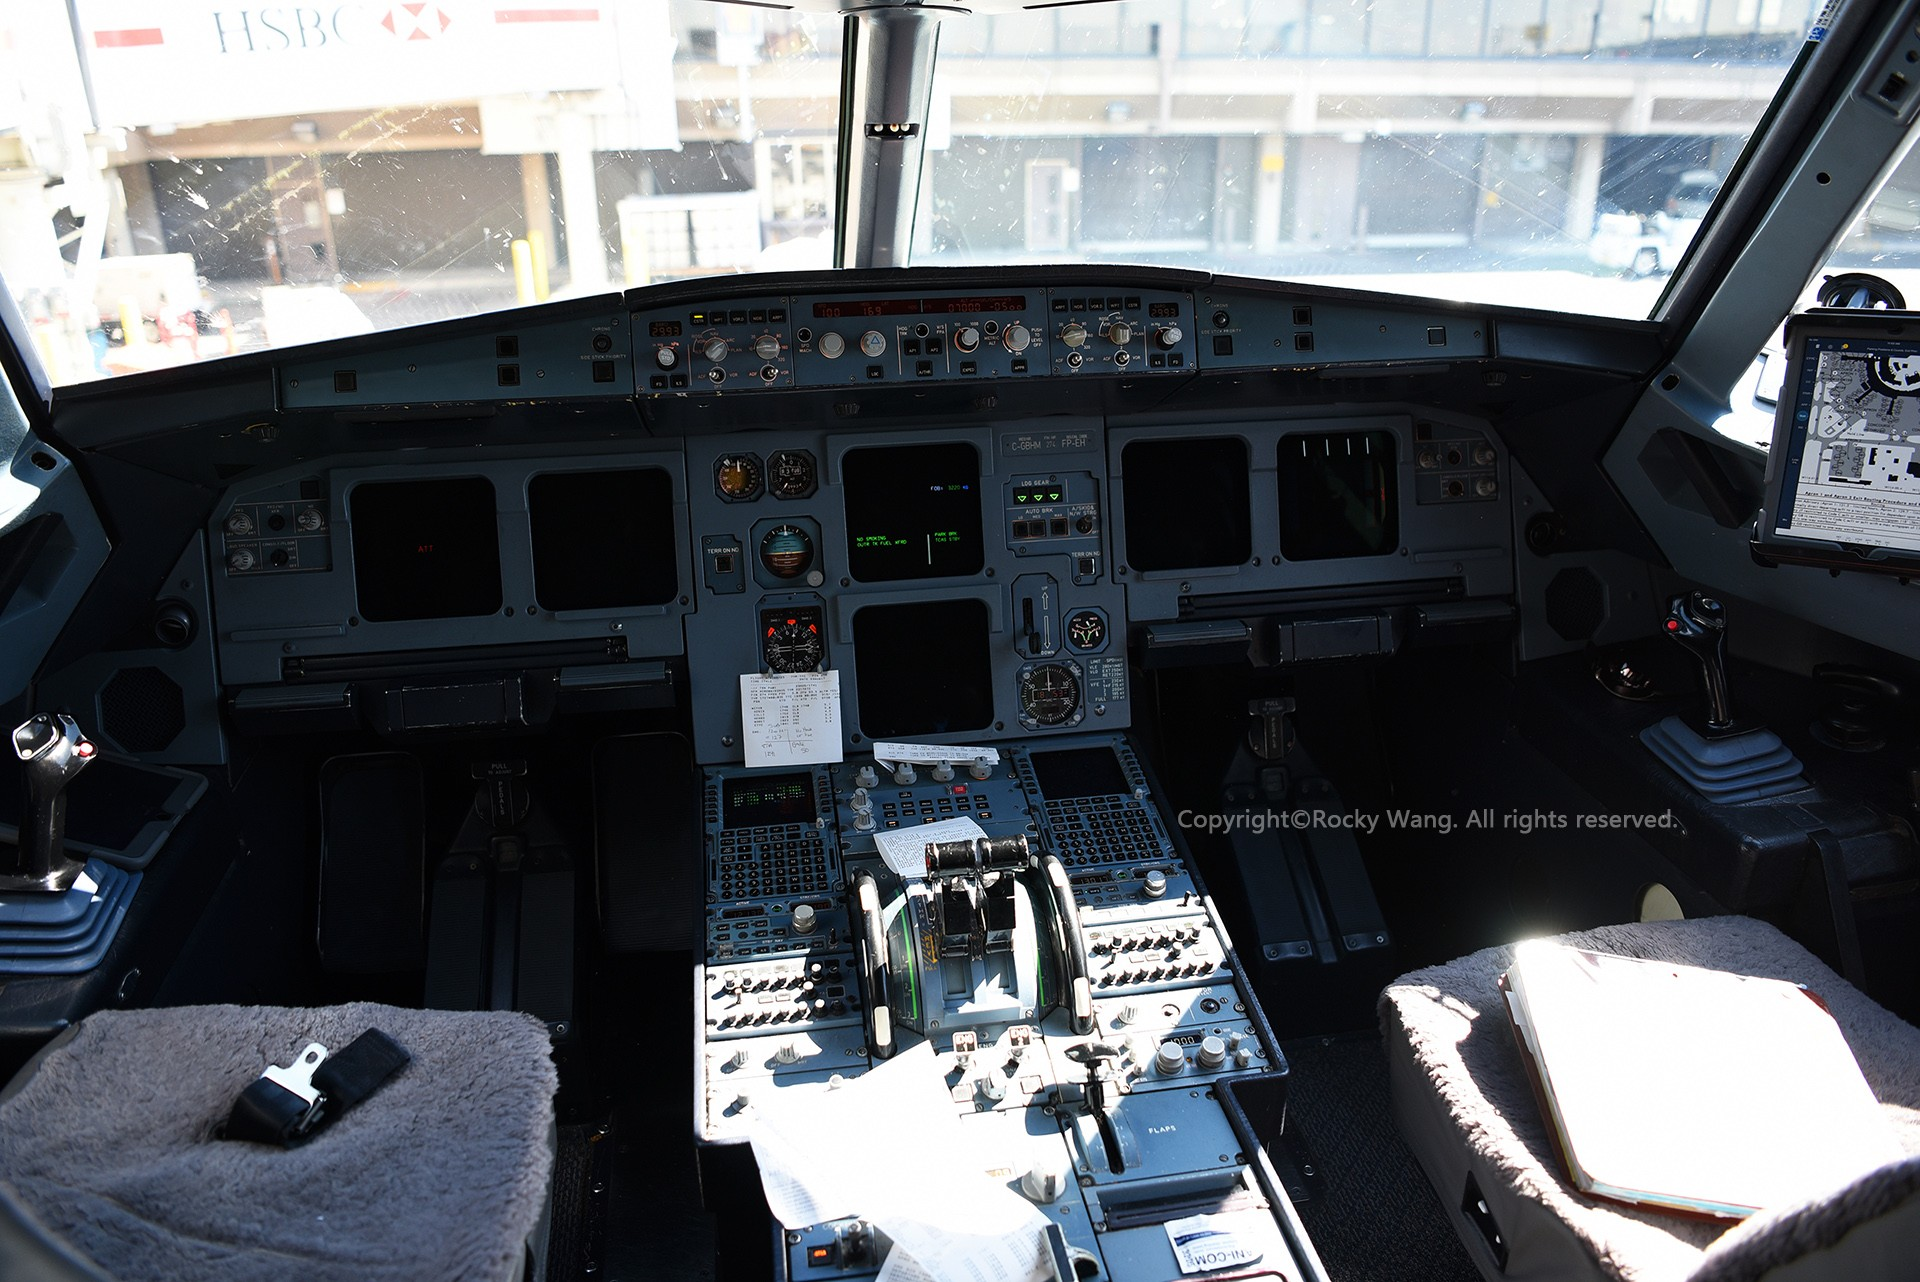 Re:[原创]简易版游记,纪念一次30段的环球飞行和一些碎碎念 AIRBUS A319-114 C-GBHM Calgary Int'l Airport